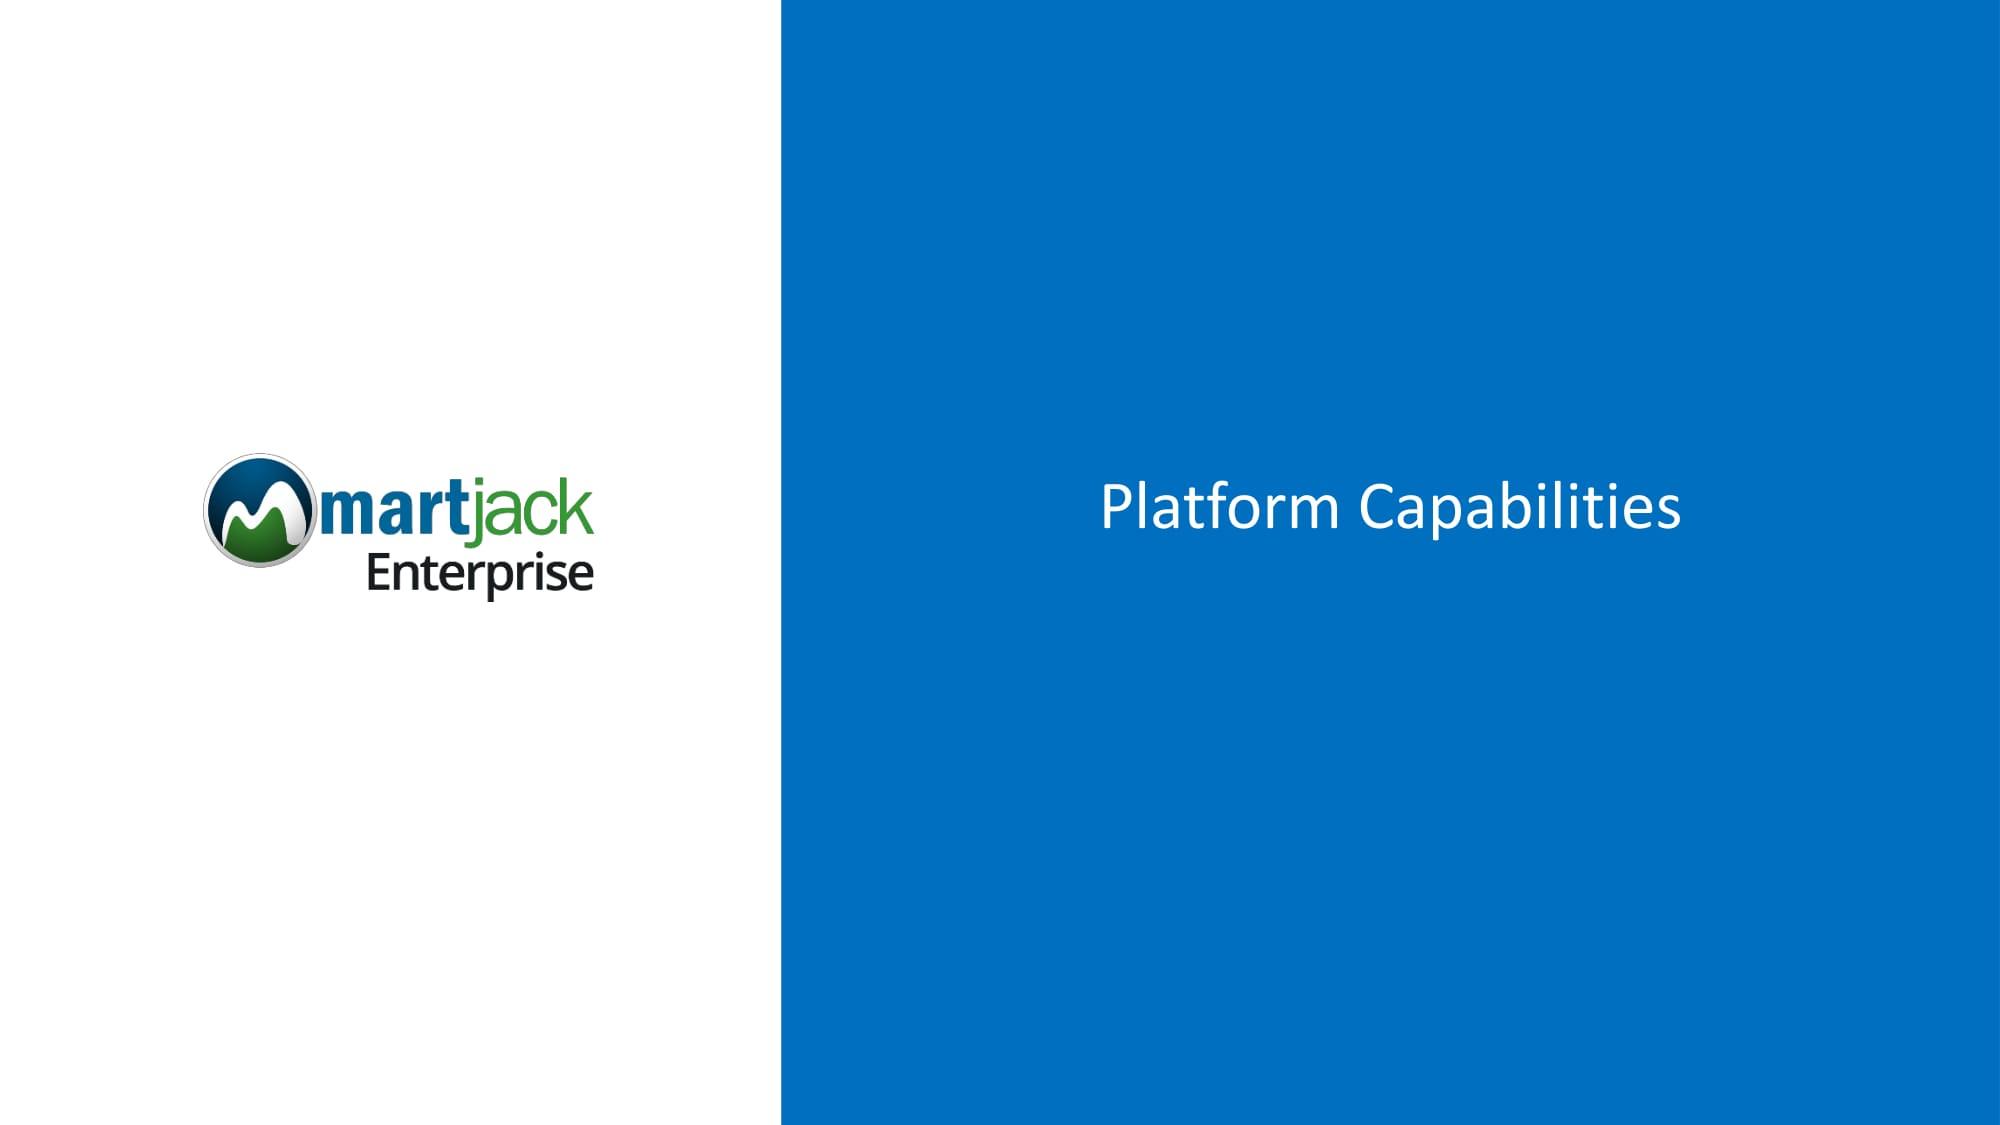 martjack_corporate_and_platform_overview-08